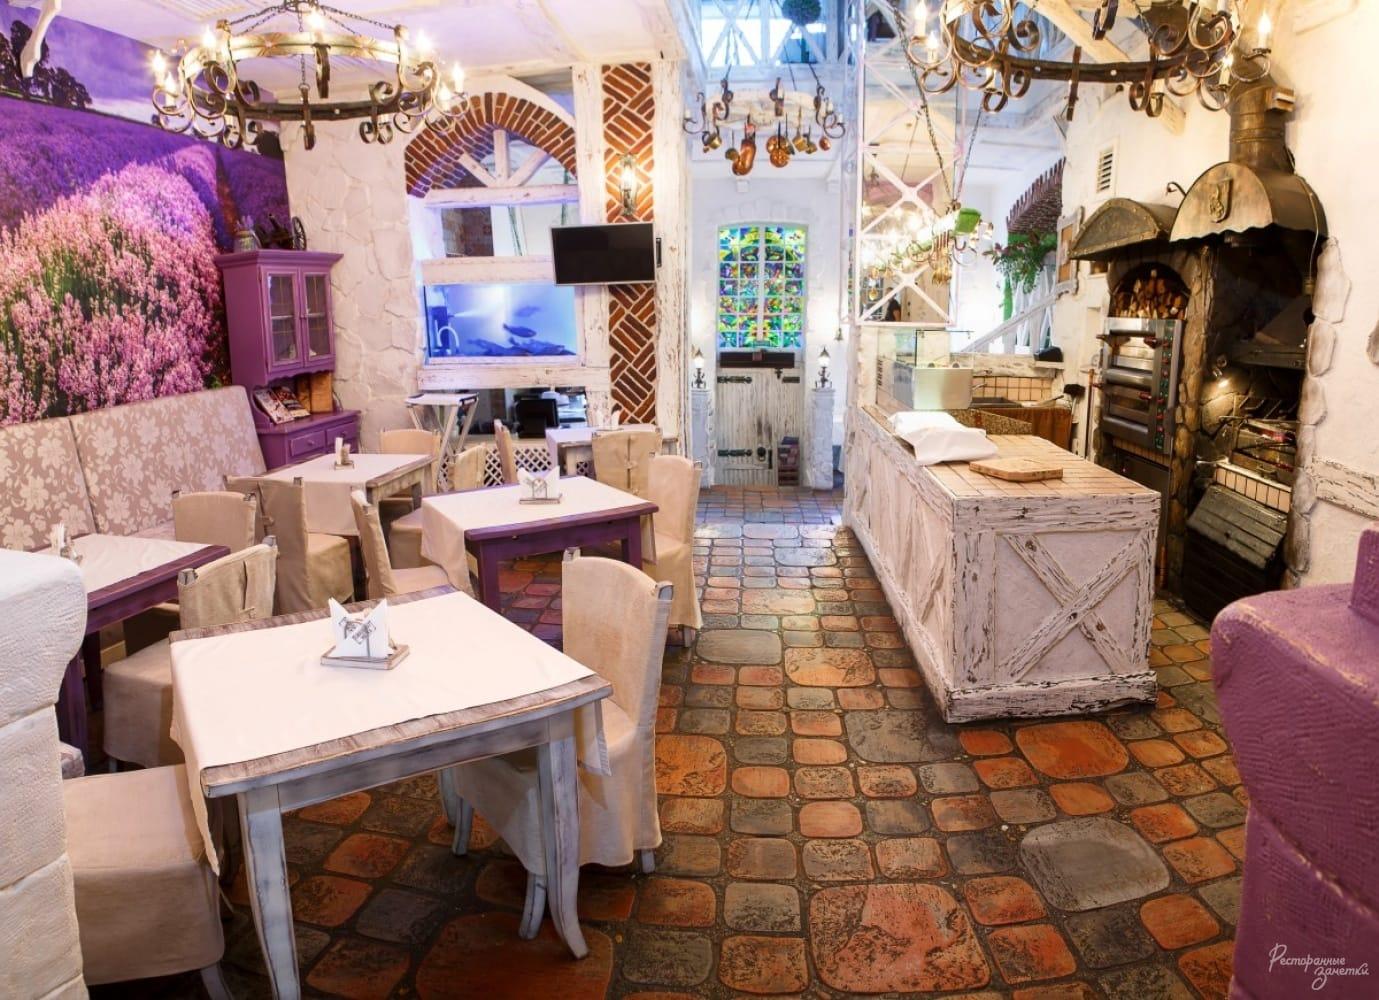 Ресторан Пушка, Харьков